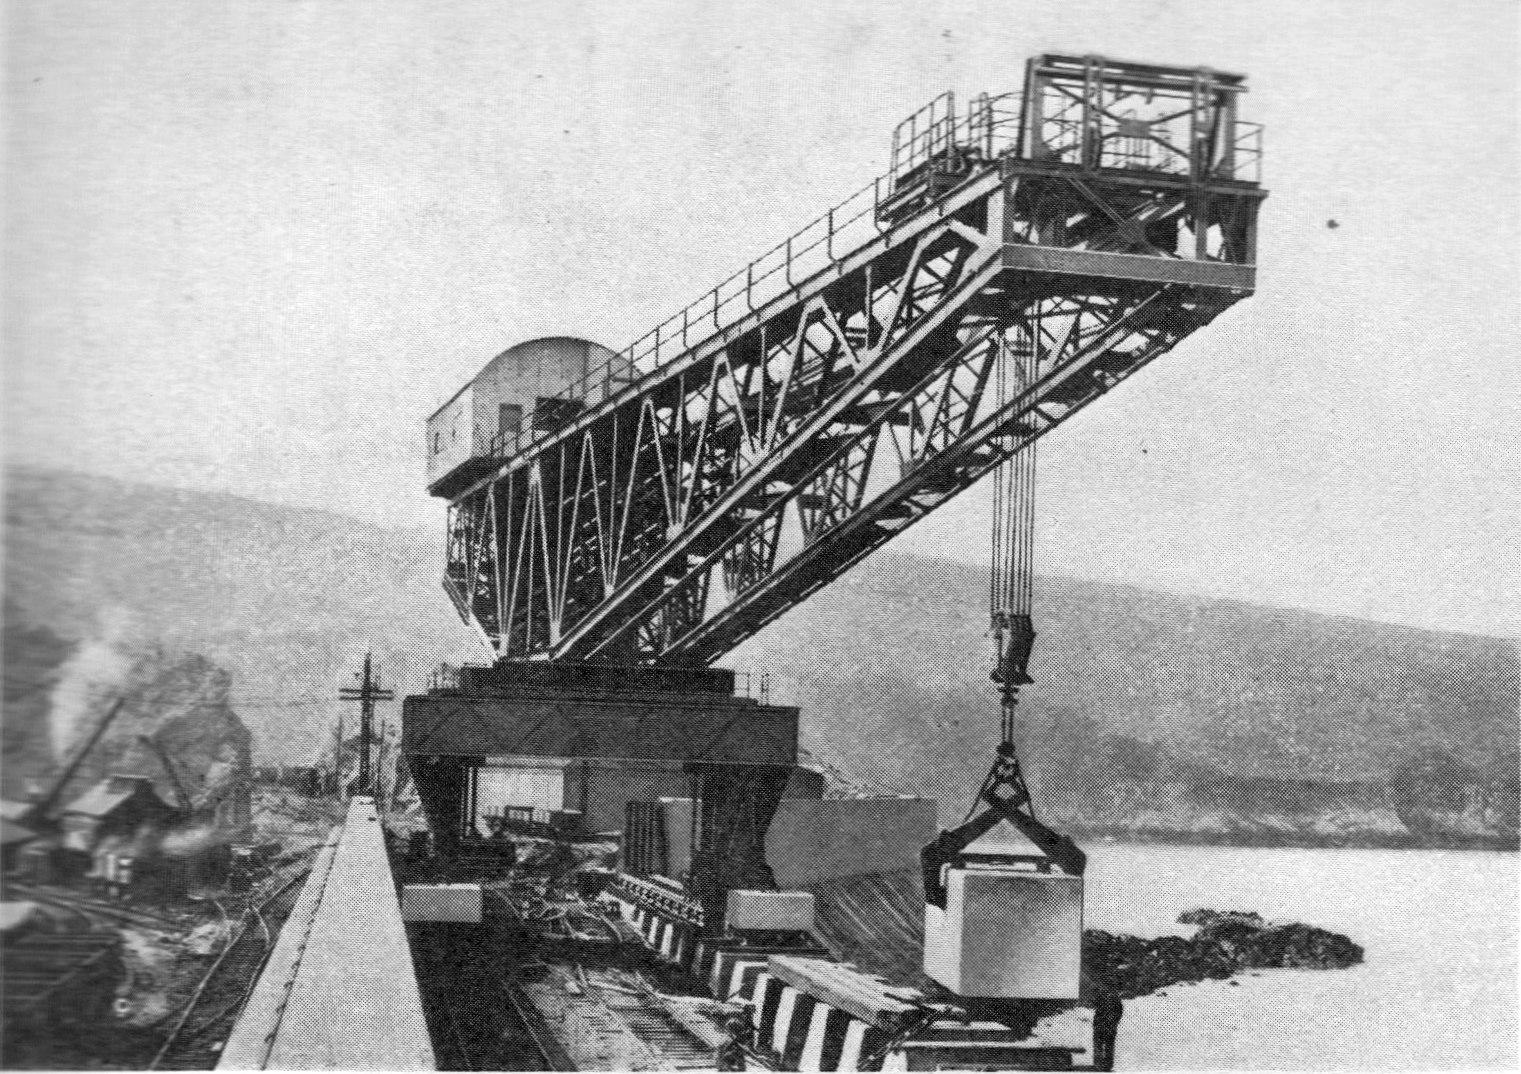 File:Stothert & Pitt, block-setting crane (Wonder Book of